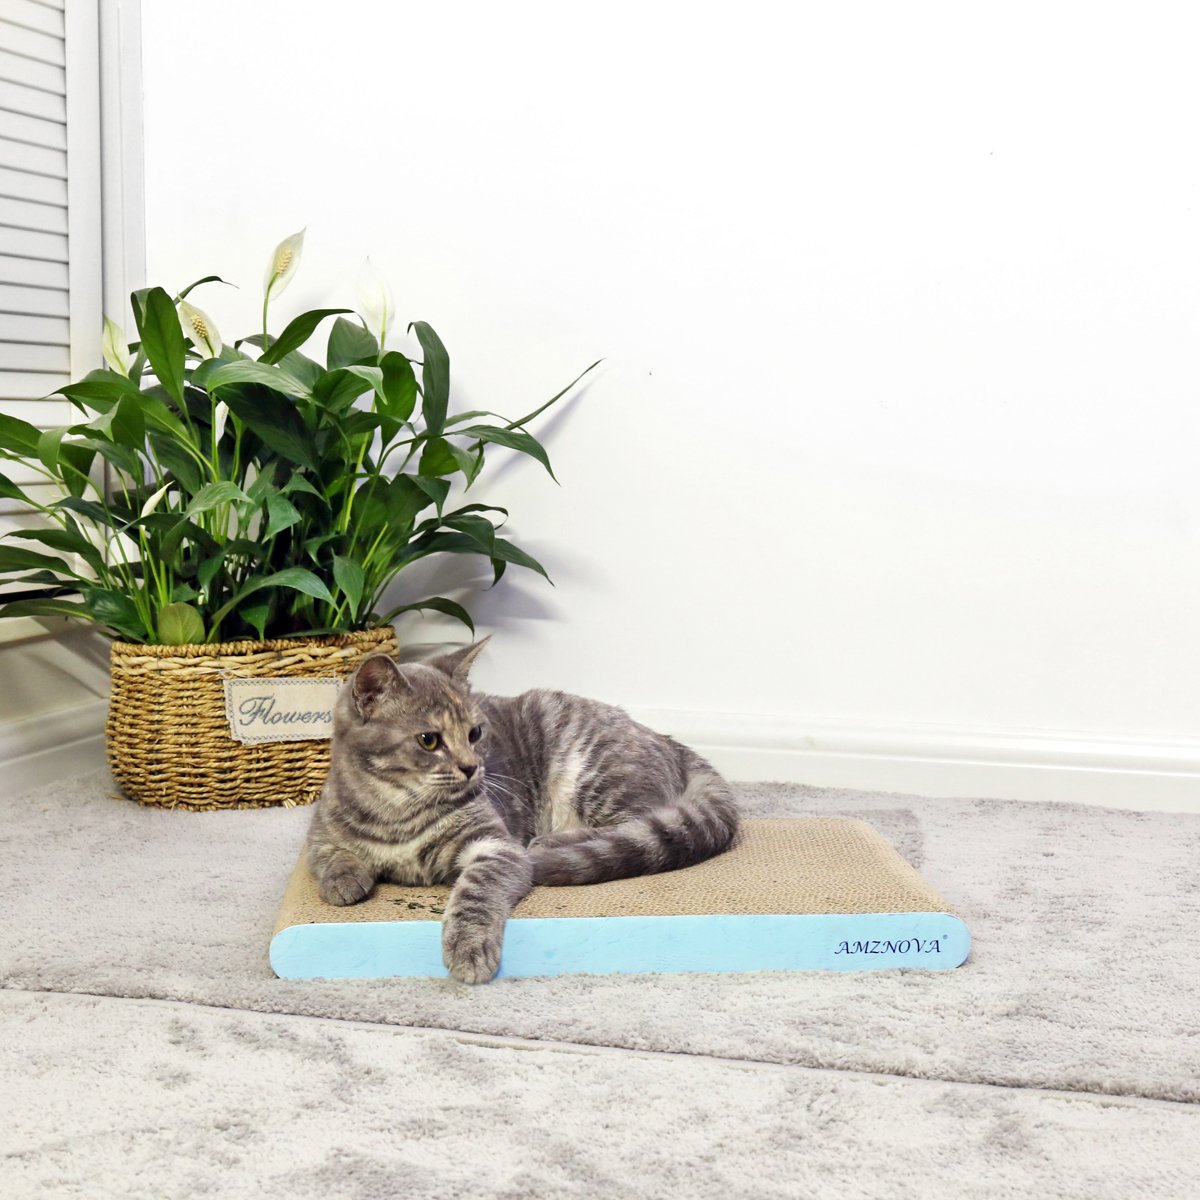 3 Pack Baby Blue AMZNOVA Cat Scratcher Cardboard Scratching Pads Scratch Sofa Lounge Narrow